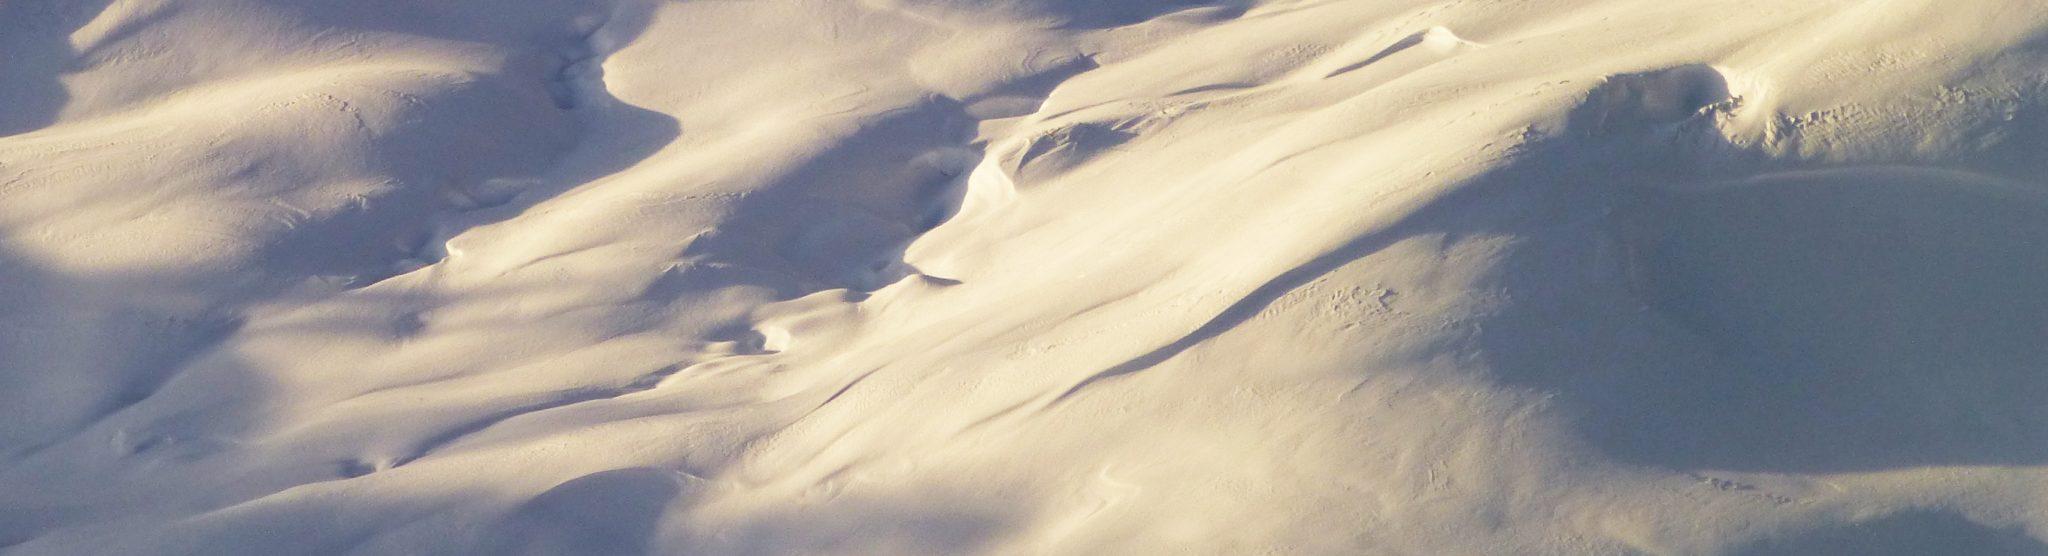 Photos des sommets alpins 10